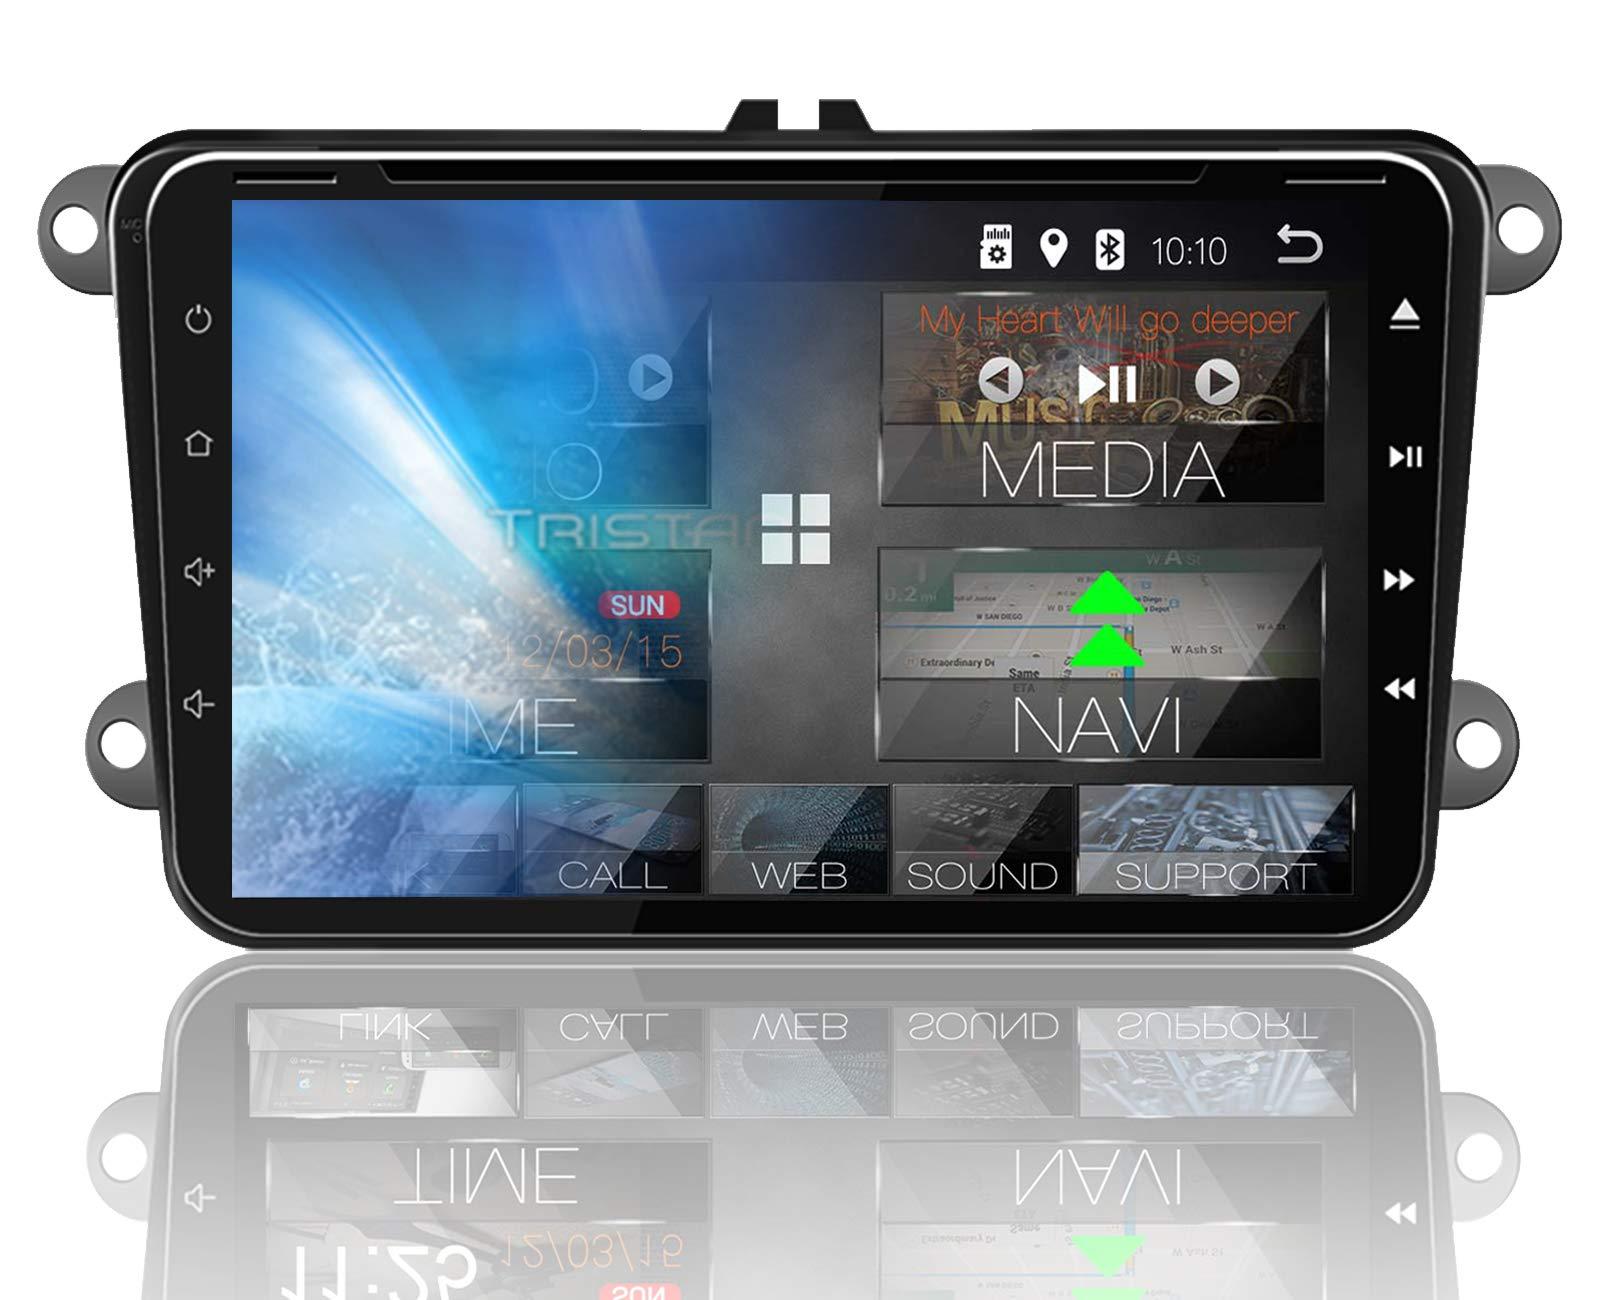 Tristan-Auron-BT2D7023VW-Autoradio-Android-81-7-Touchscreen-Bildschirm-GPS-Navi-Bluetooth-Freisprecheinrichtung-Quad-Core-USBSD-OBD-2-DAB-2-DIN-I-VW-Seat-Skoda